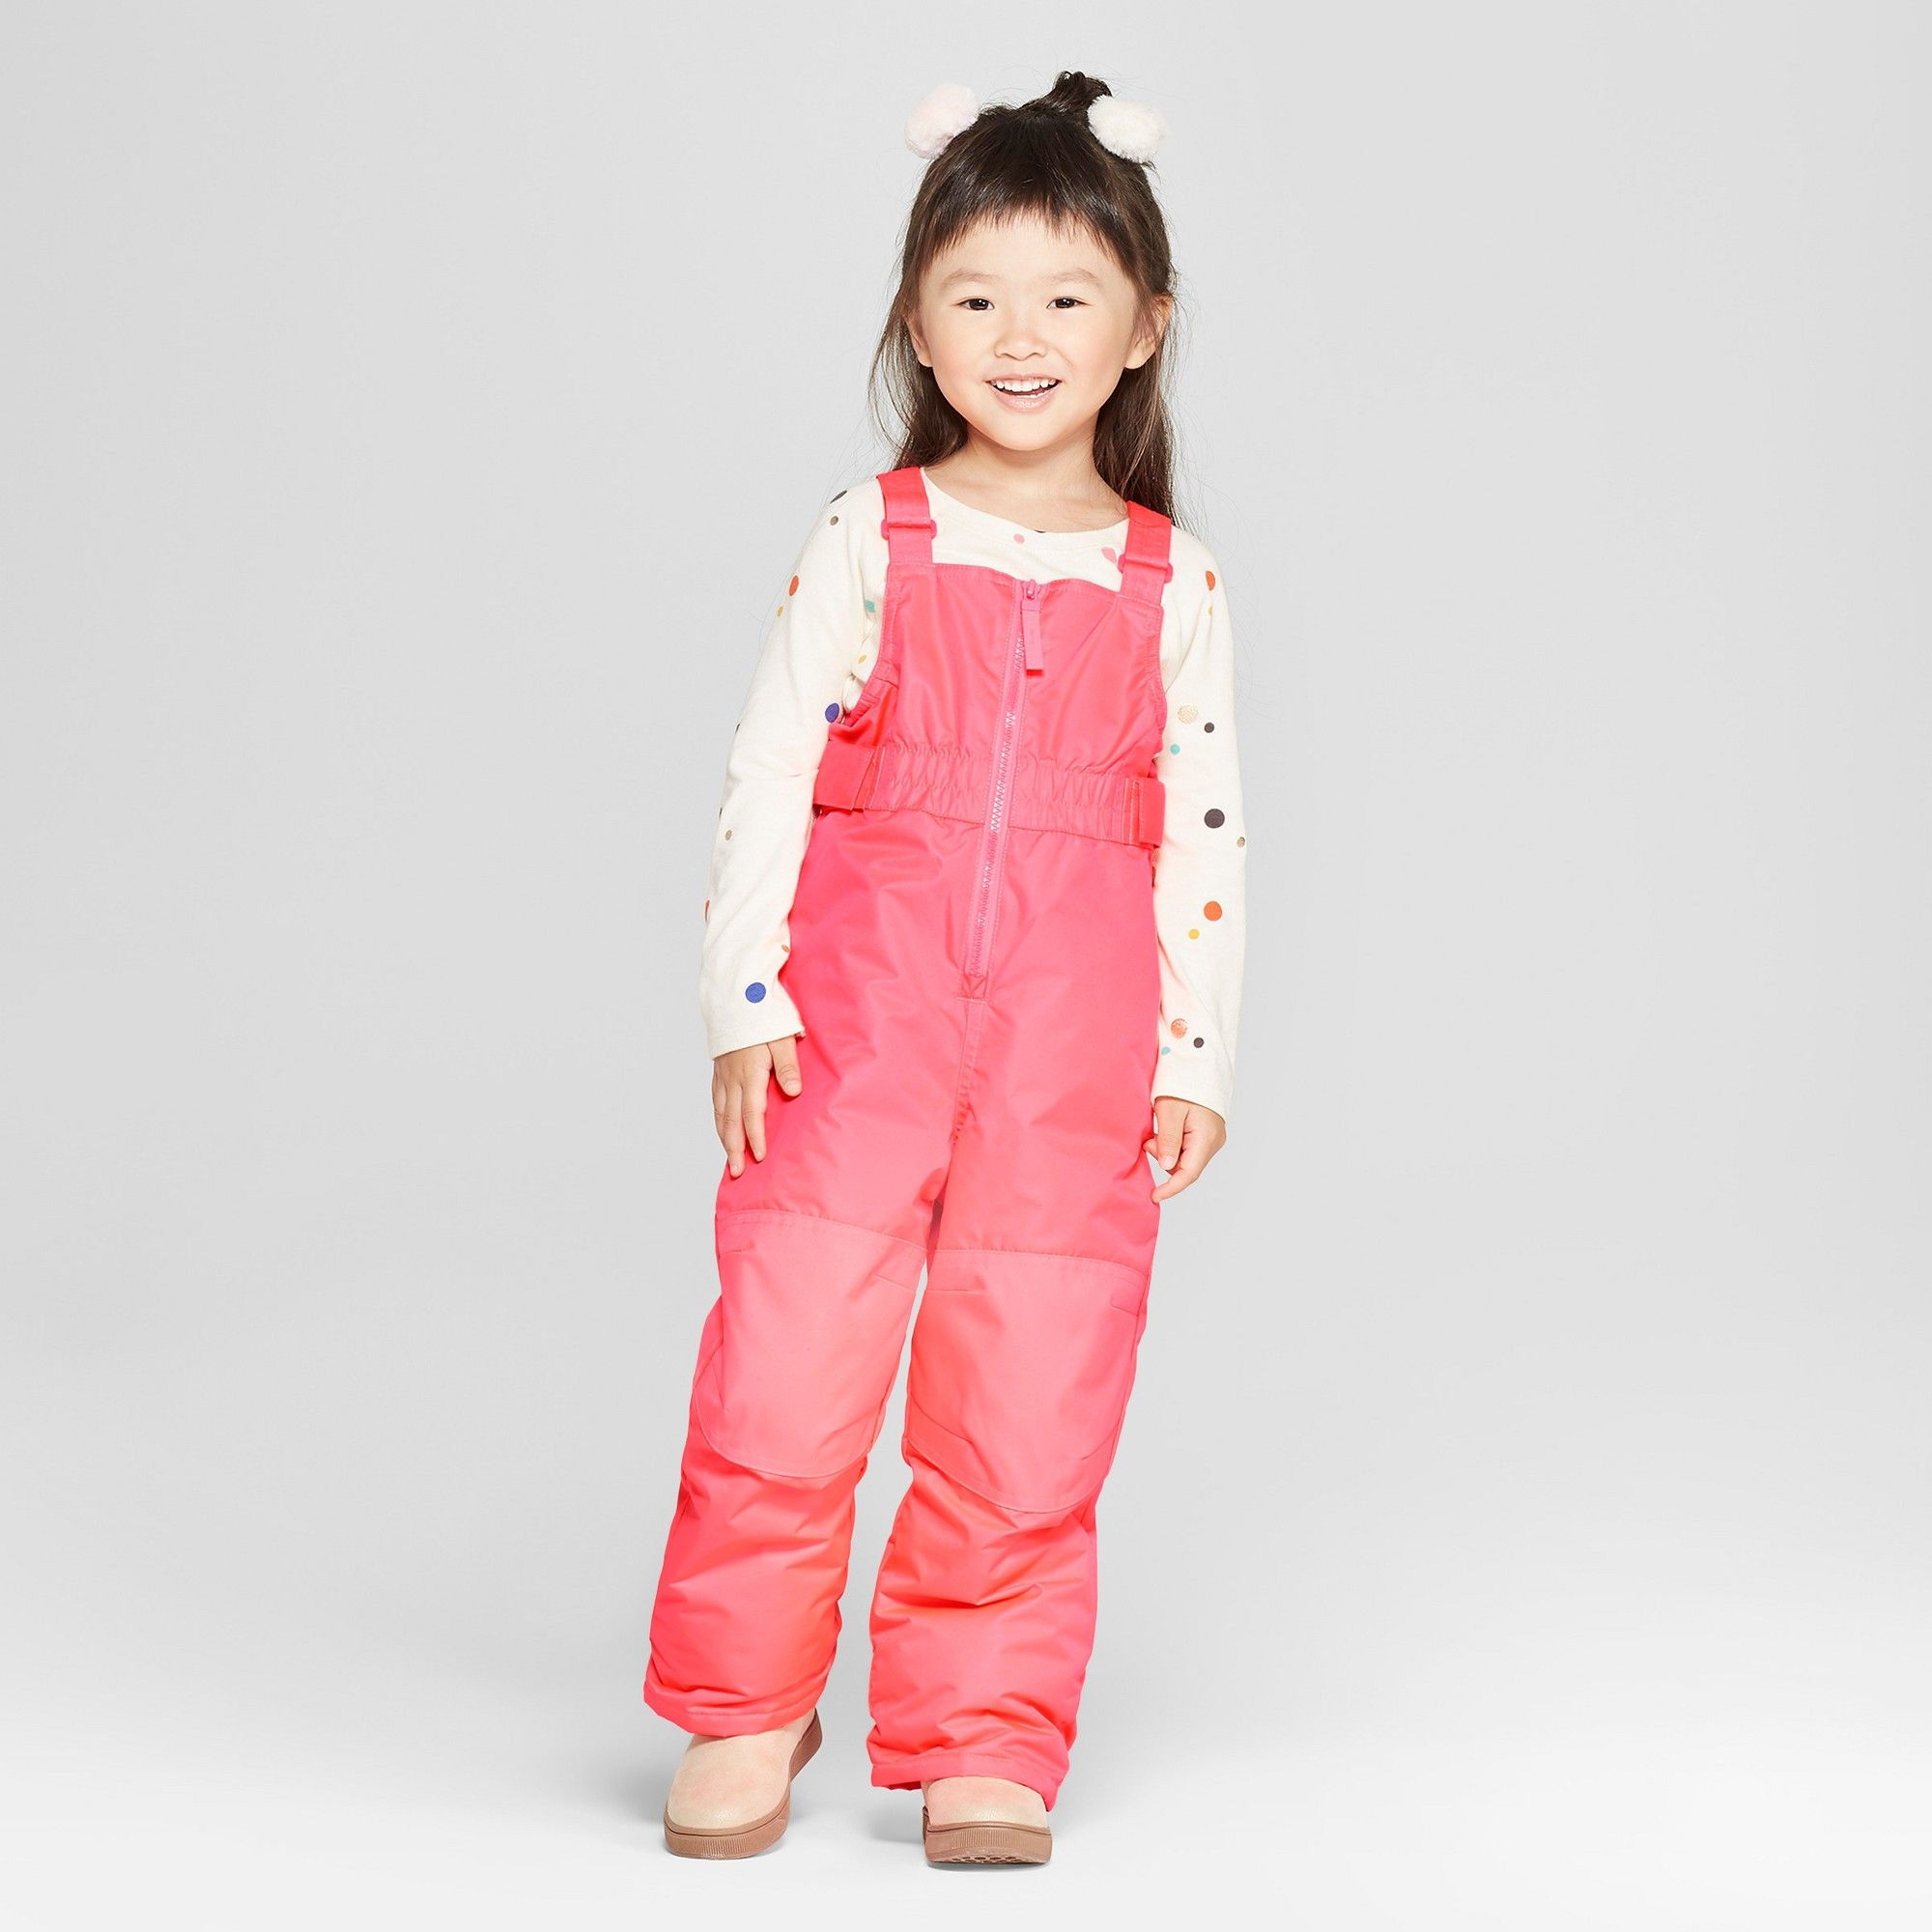 307ed8664 Toddler Girls  Snow Pants - Cat   Jack Pink 4T